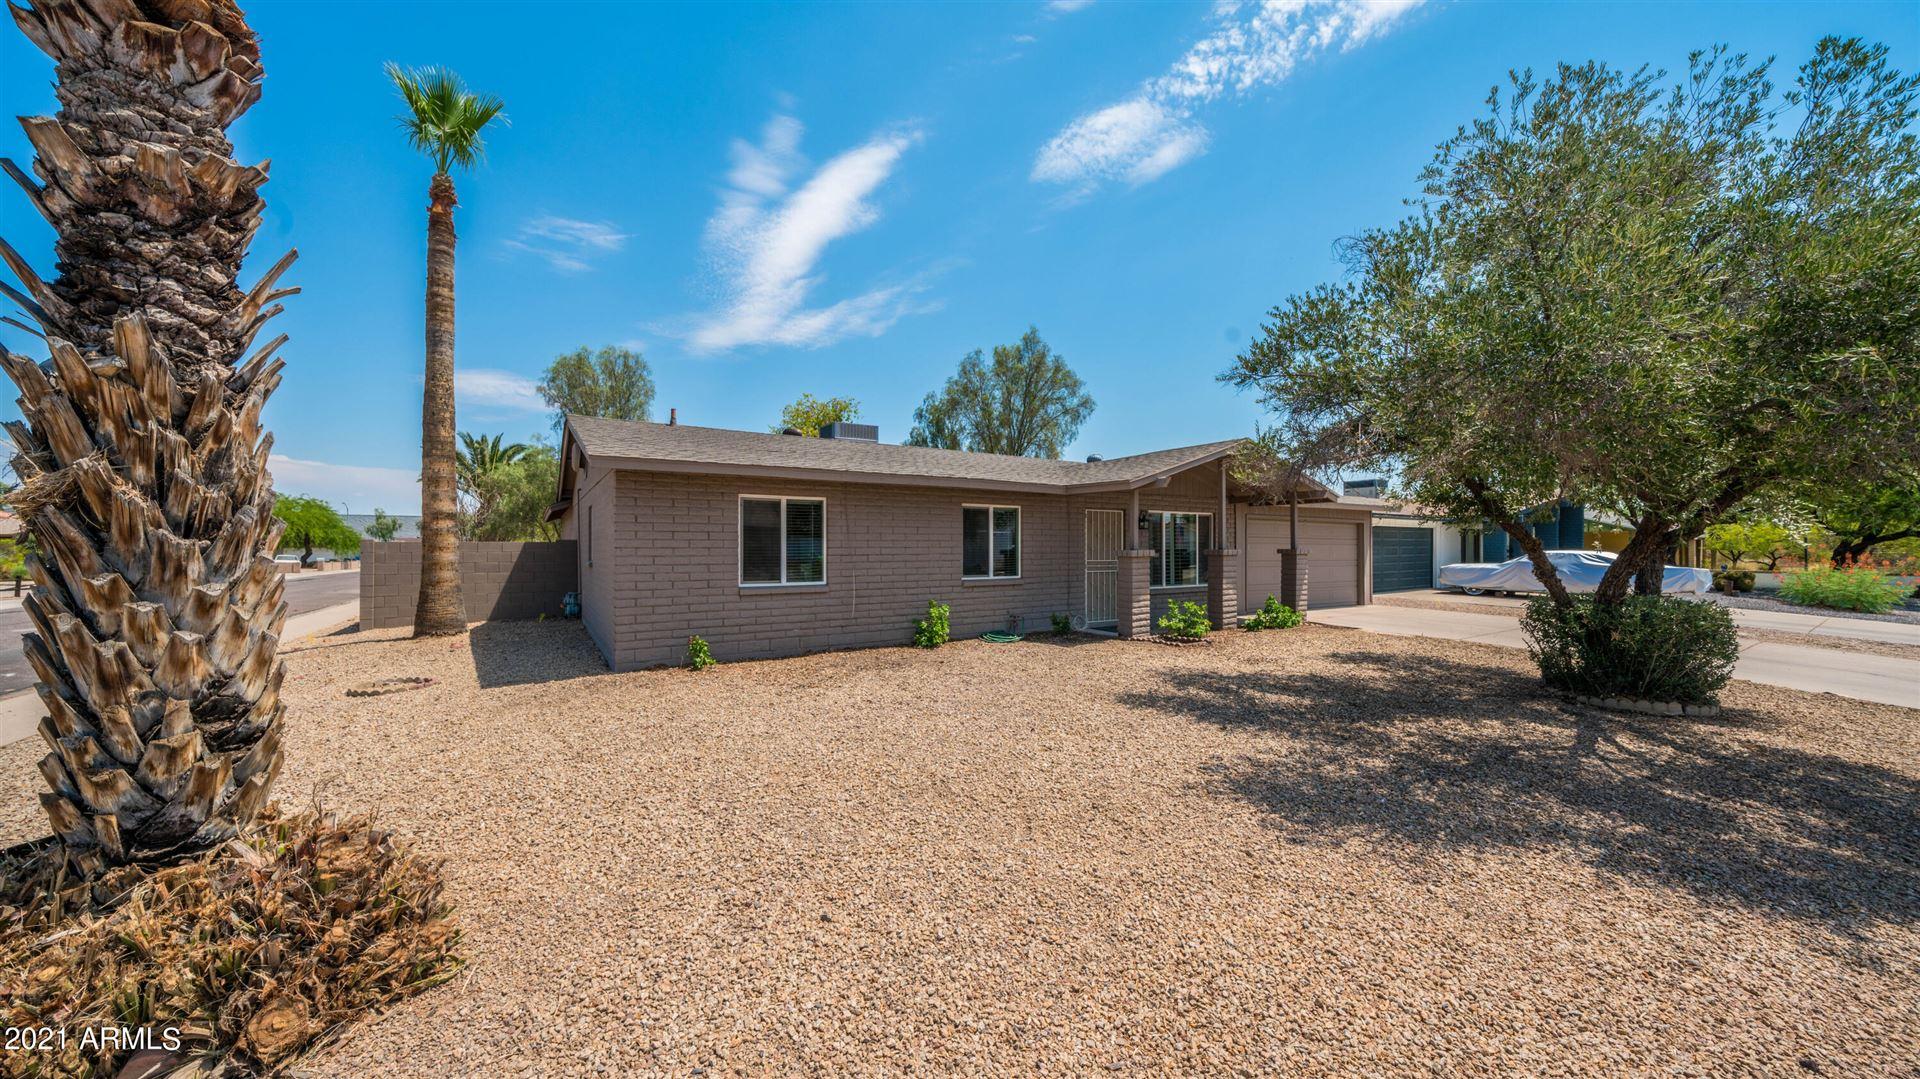 3232 E POINSETTIA Drive, Phoenix, AZ 85028 - MLS#: 6257896